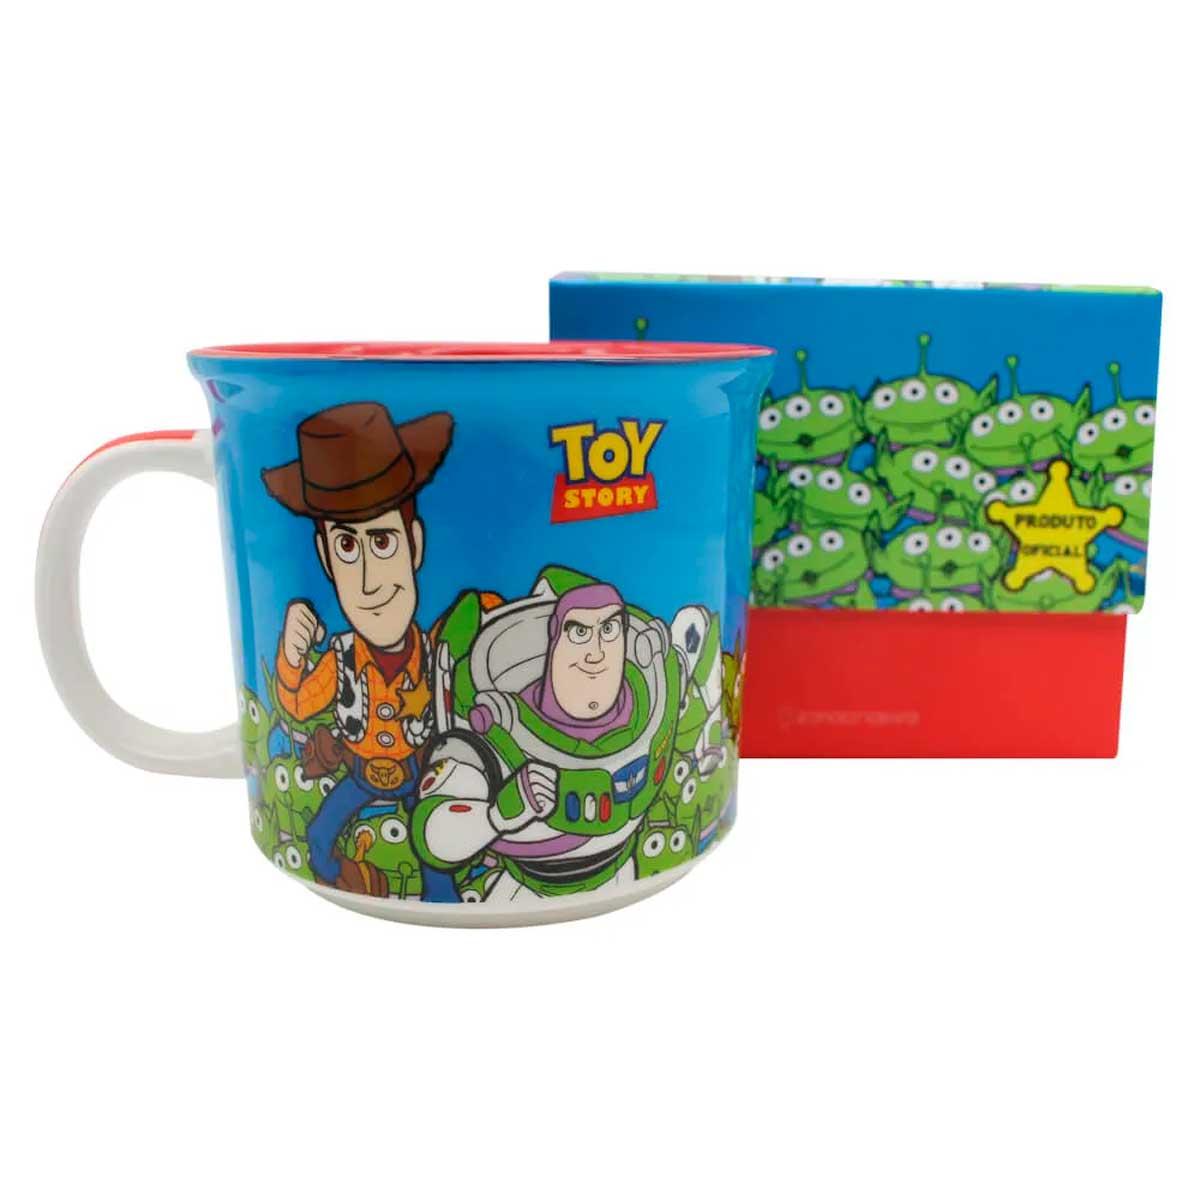 Caneca Toy Story - Woody e Buzz Lightyear - Presente Super